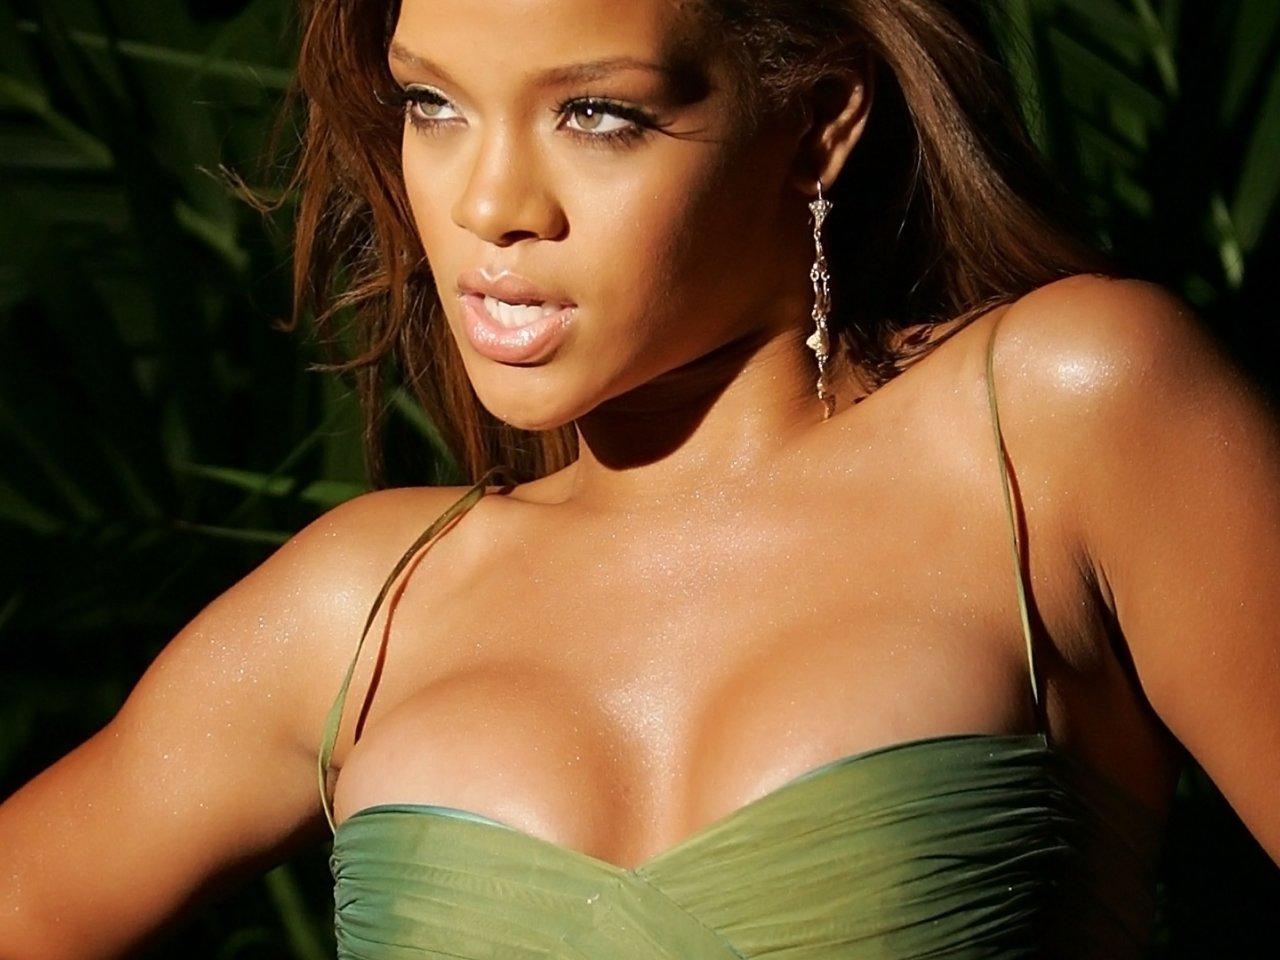 http://2.bp.blogspot.com/-pUo7YgZ7Zbc/T578bQo9aOI/AAAAAAAACOo/x2XFF7Iqcos/s1600/Rihanna+wallpapers+5.jpg